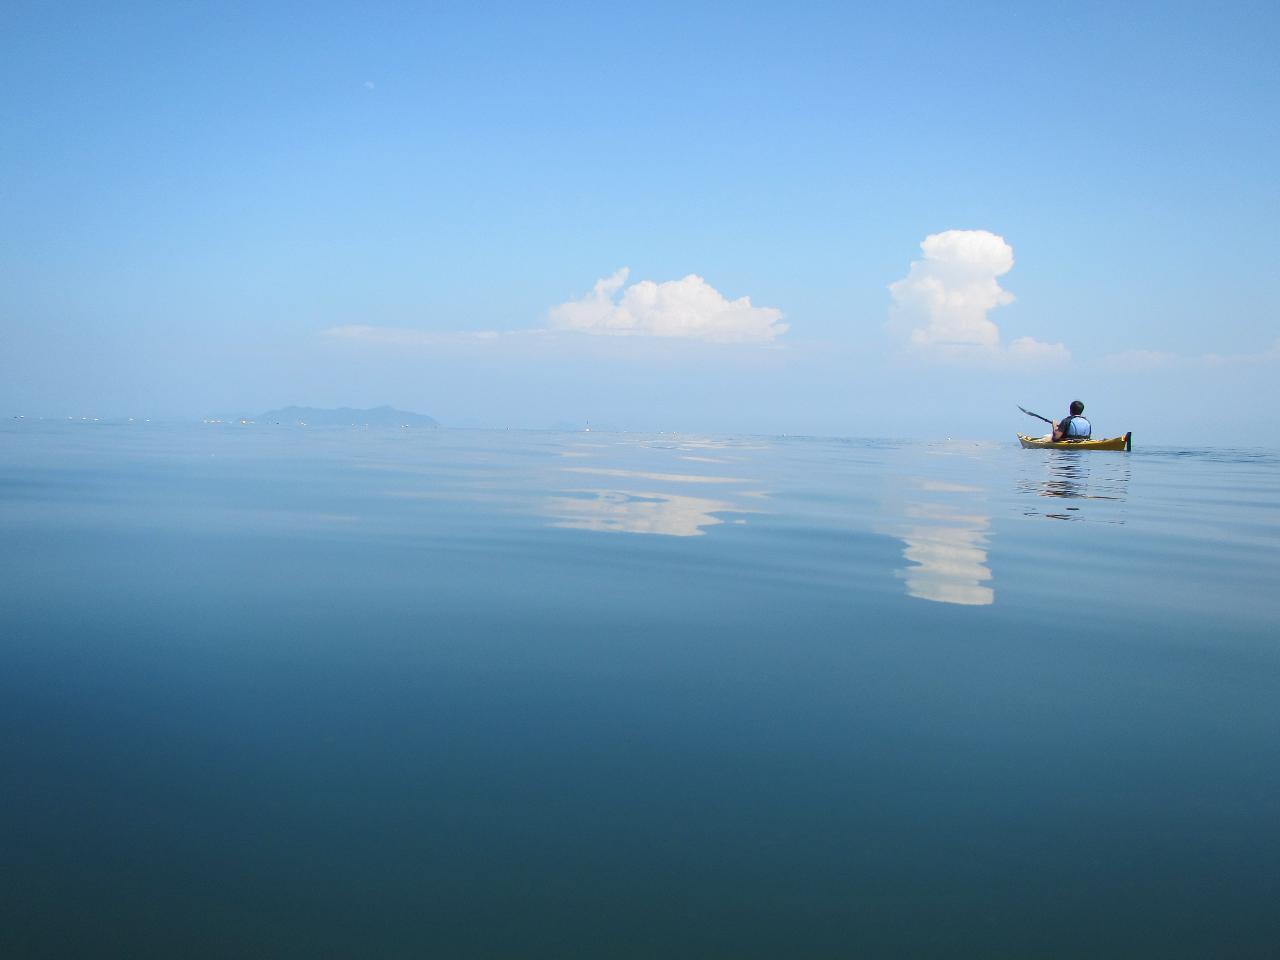 【Kayaker's Cafe】*도모노우라* 점심 식사 포함 씨카약 투어! 씨카약을 타고 모험하는 하루 만끽 투어/*鞆の浦*ランチ付シーカヤックツアー!シーカヤックで冒険する一日満喫ツアー